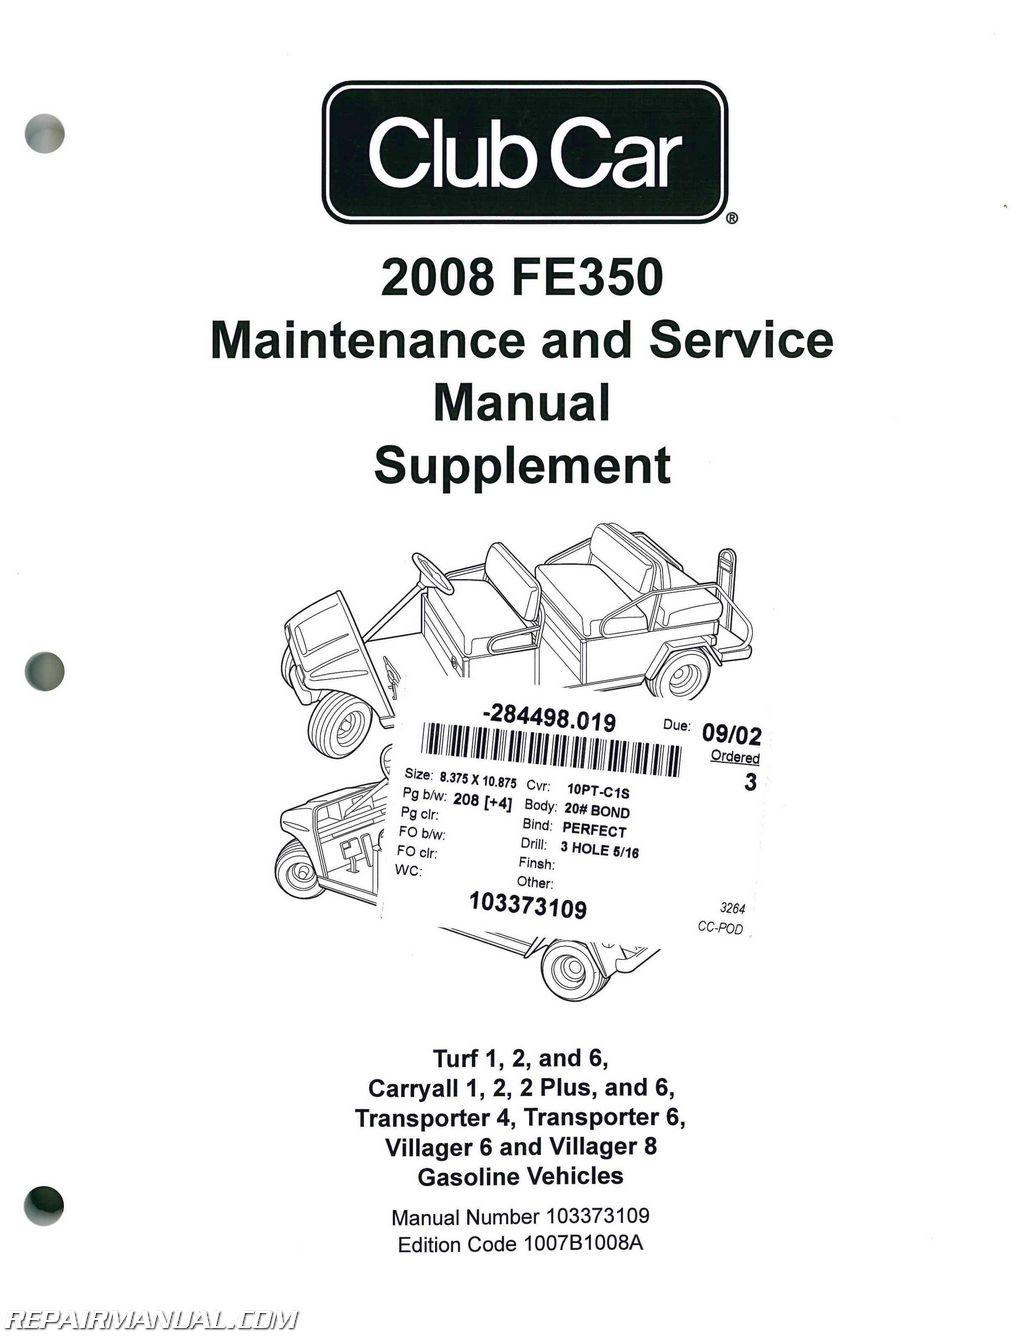 2008 Club Car FE350 Gasoline Maintenance Golf Cart Service Manual Supplement